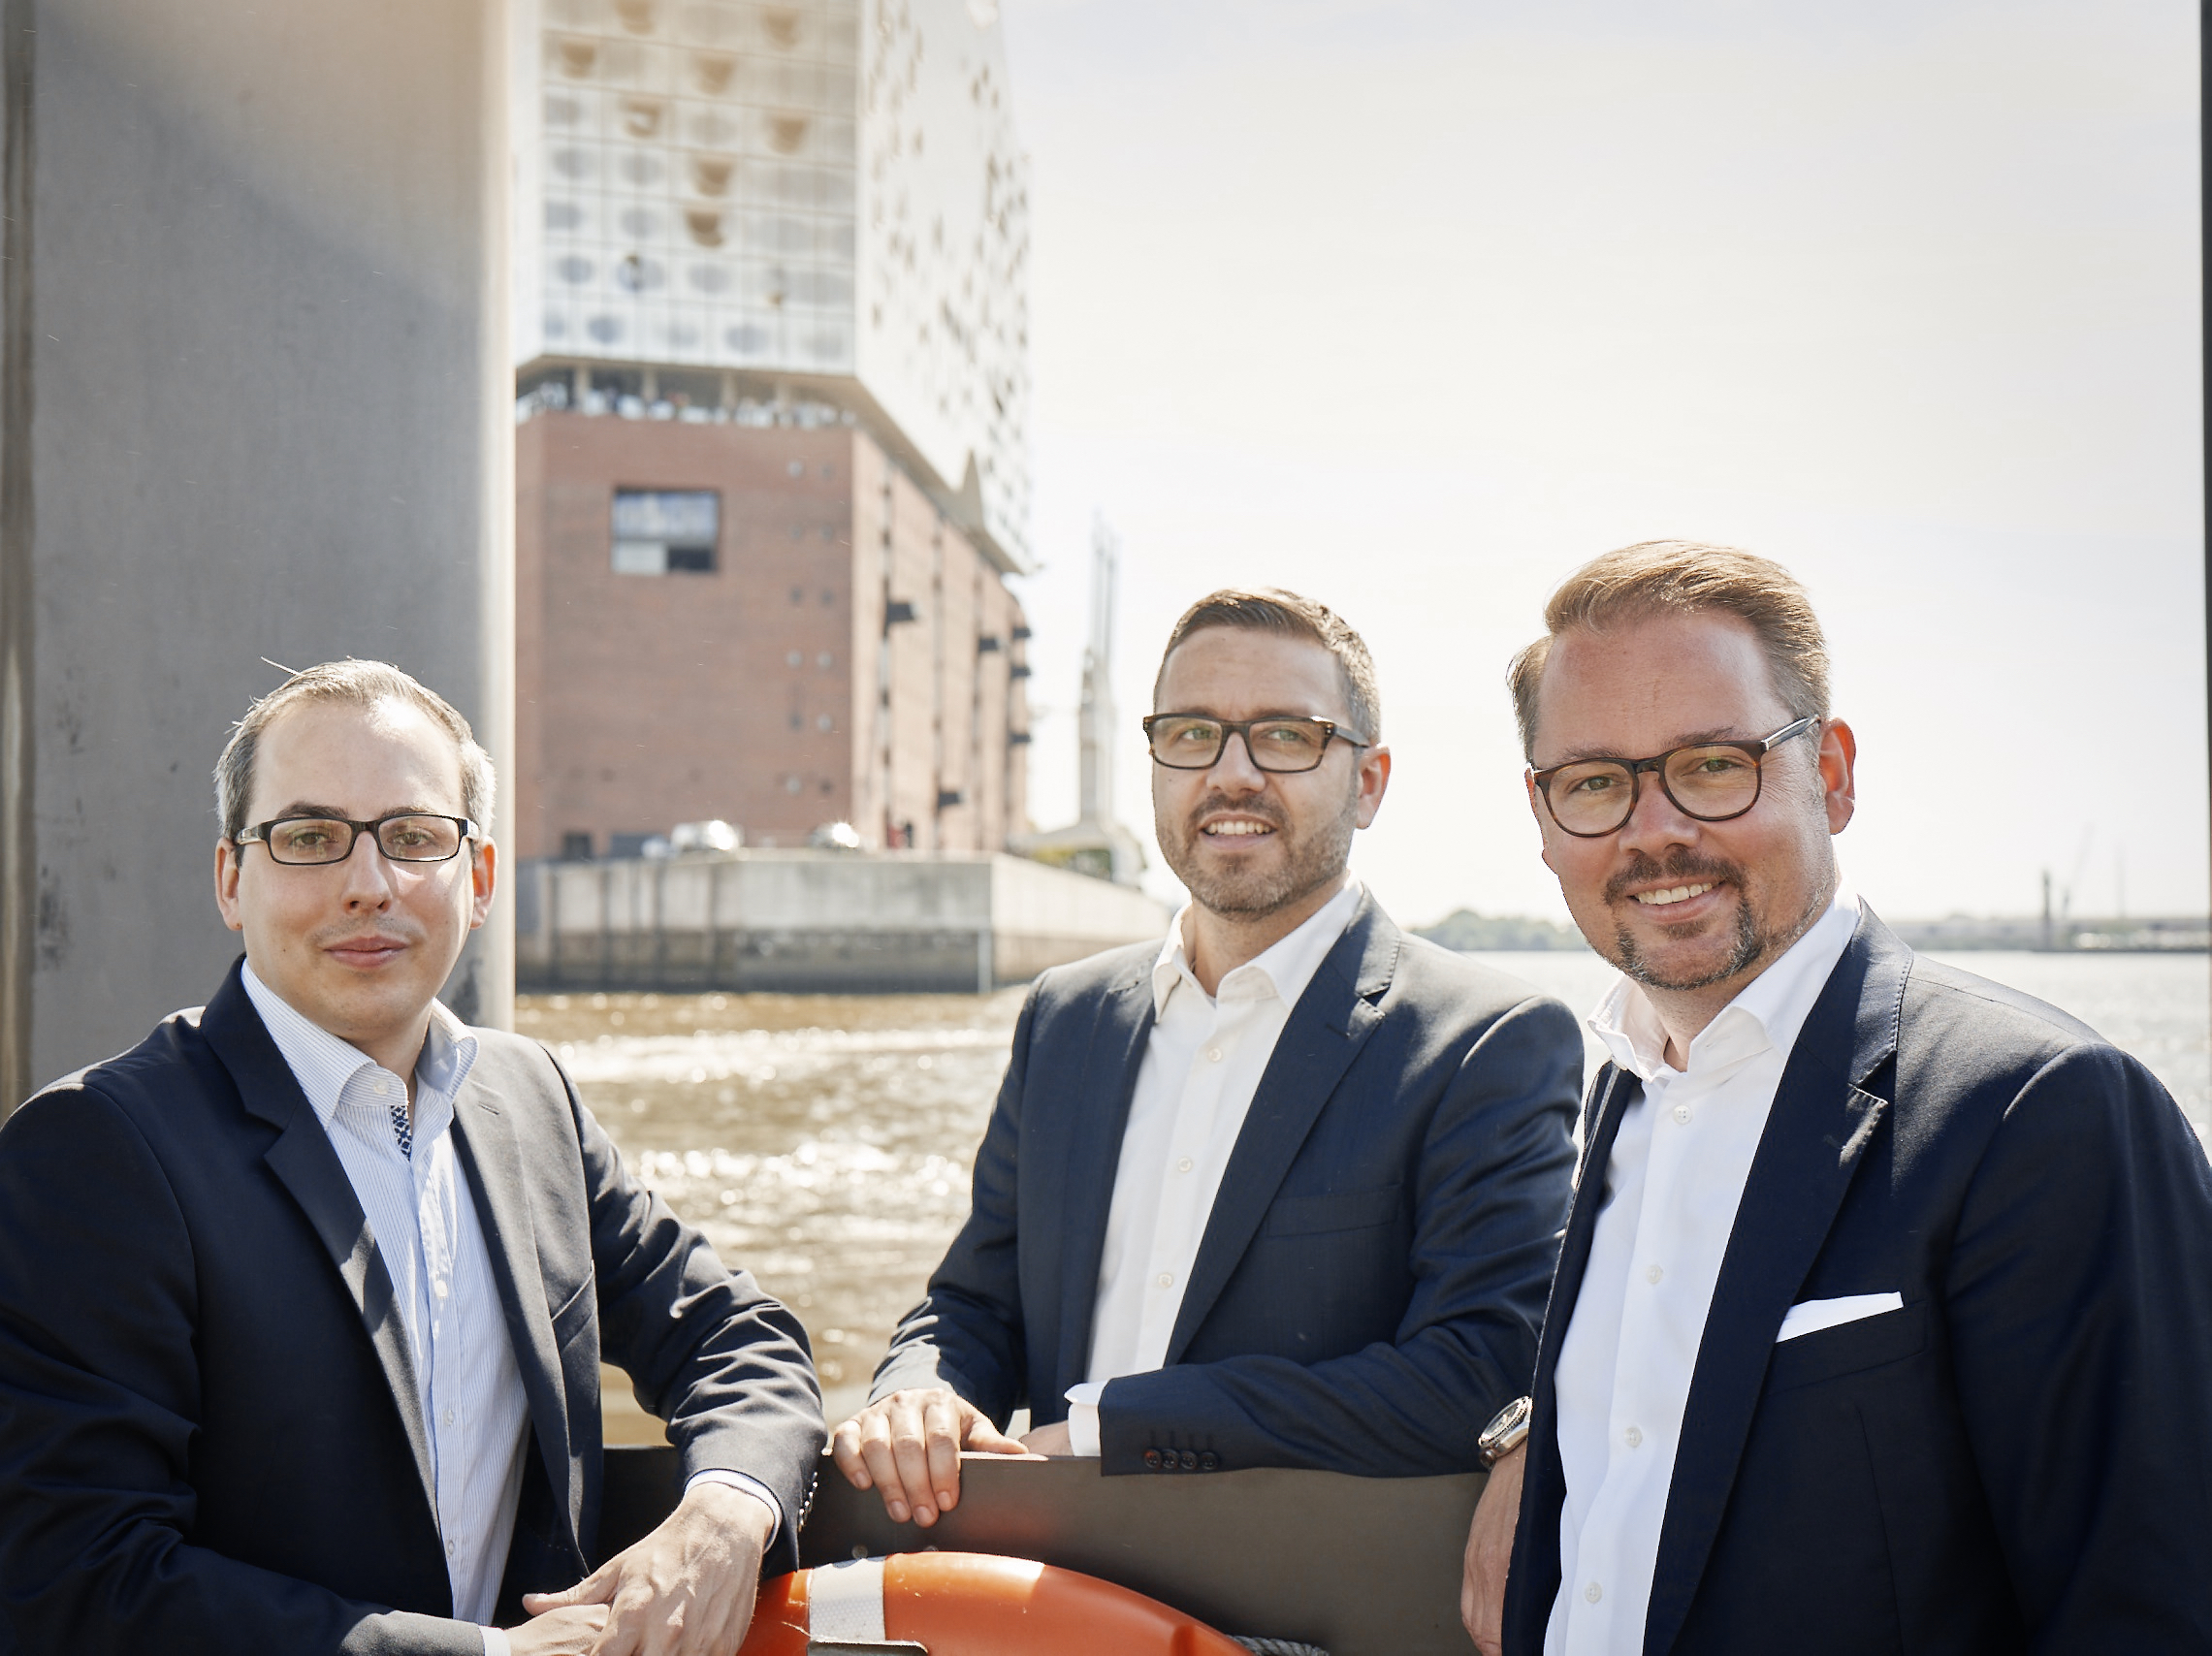 Oliver Engelken, Guido Pade, Robert Kabs